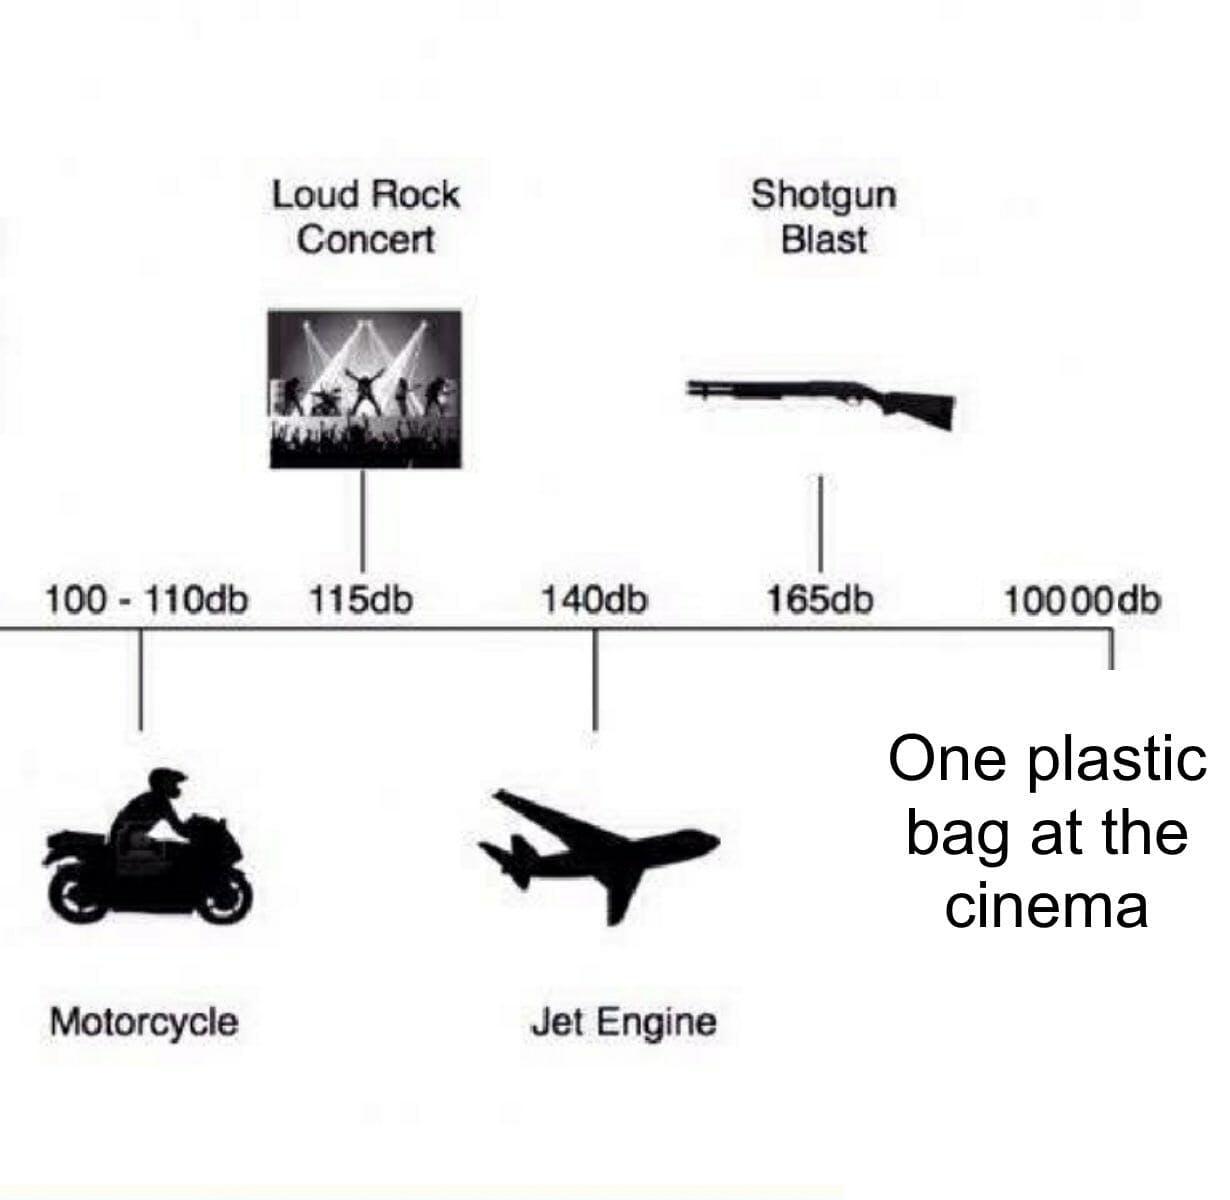 sound levels meme : plastic bag at the cinema